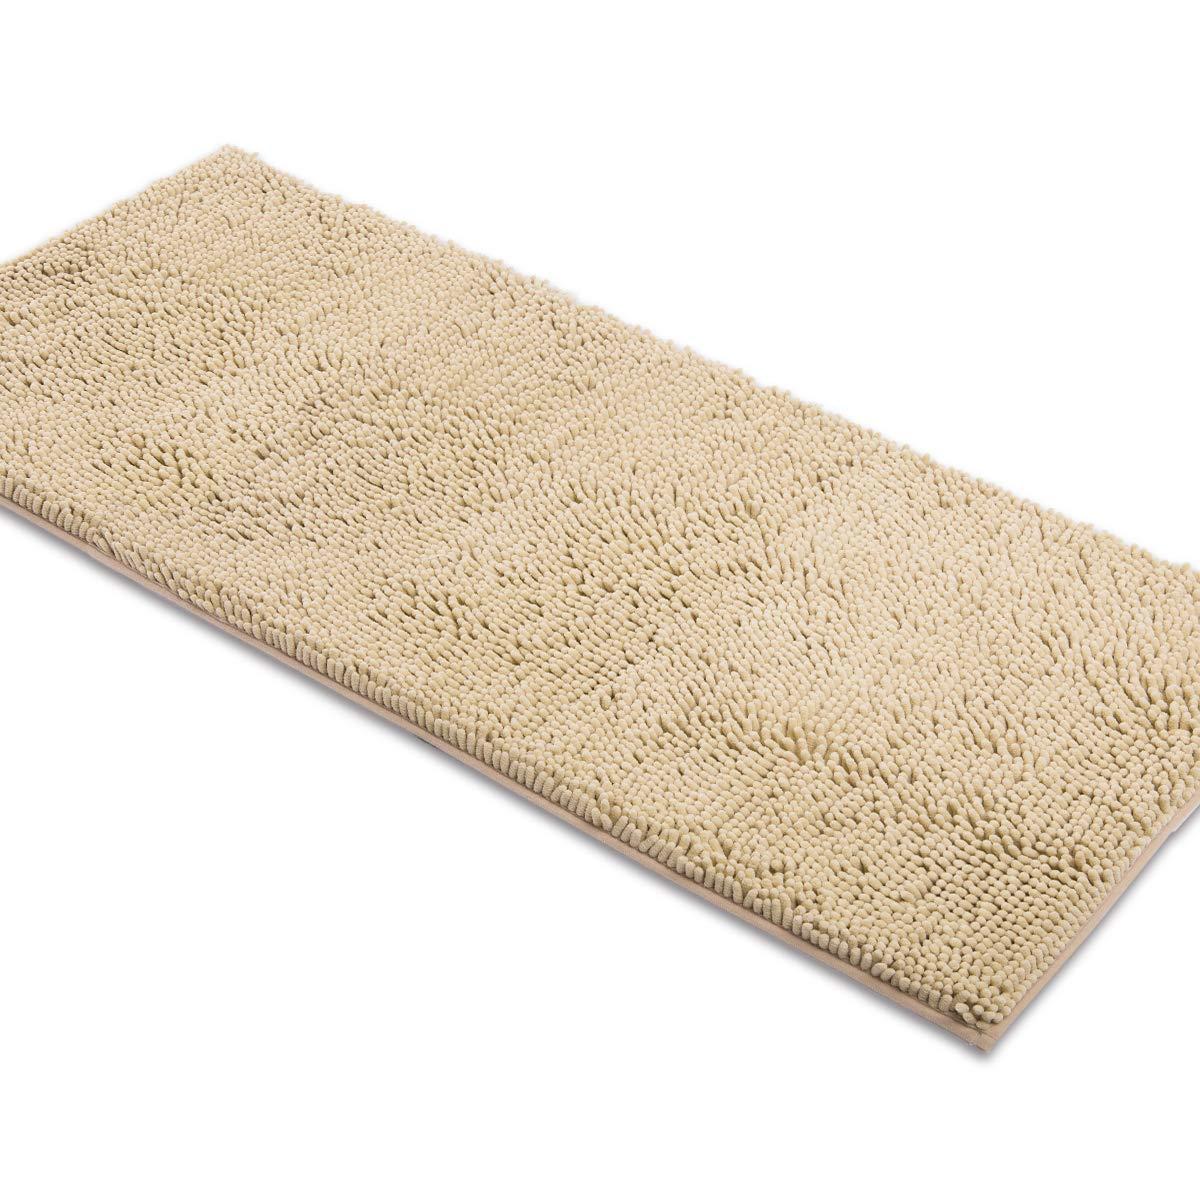 MAYSHINE Non-Slip Bathroom Rug Shag Shower Mat Machine-Washable Bath mats (27.5x47 inch) with Water Absorbent Soft Microfibers of - Beige